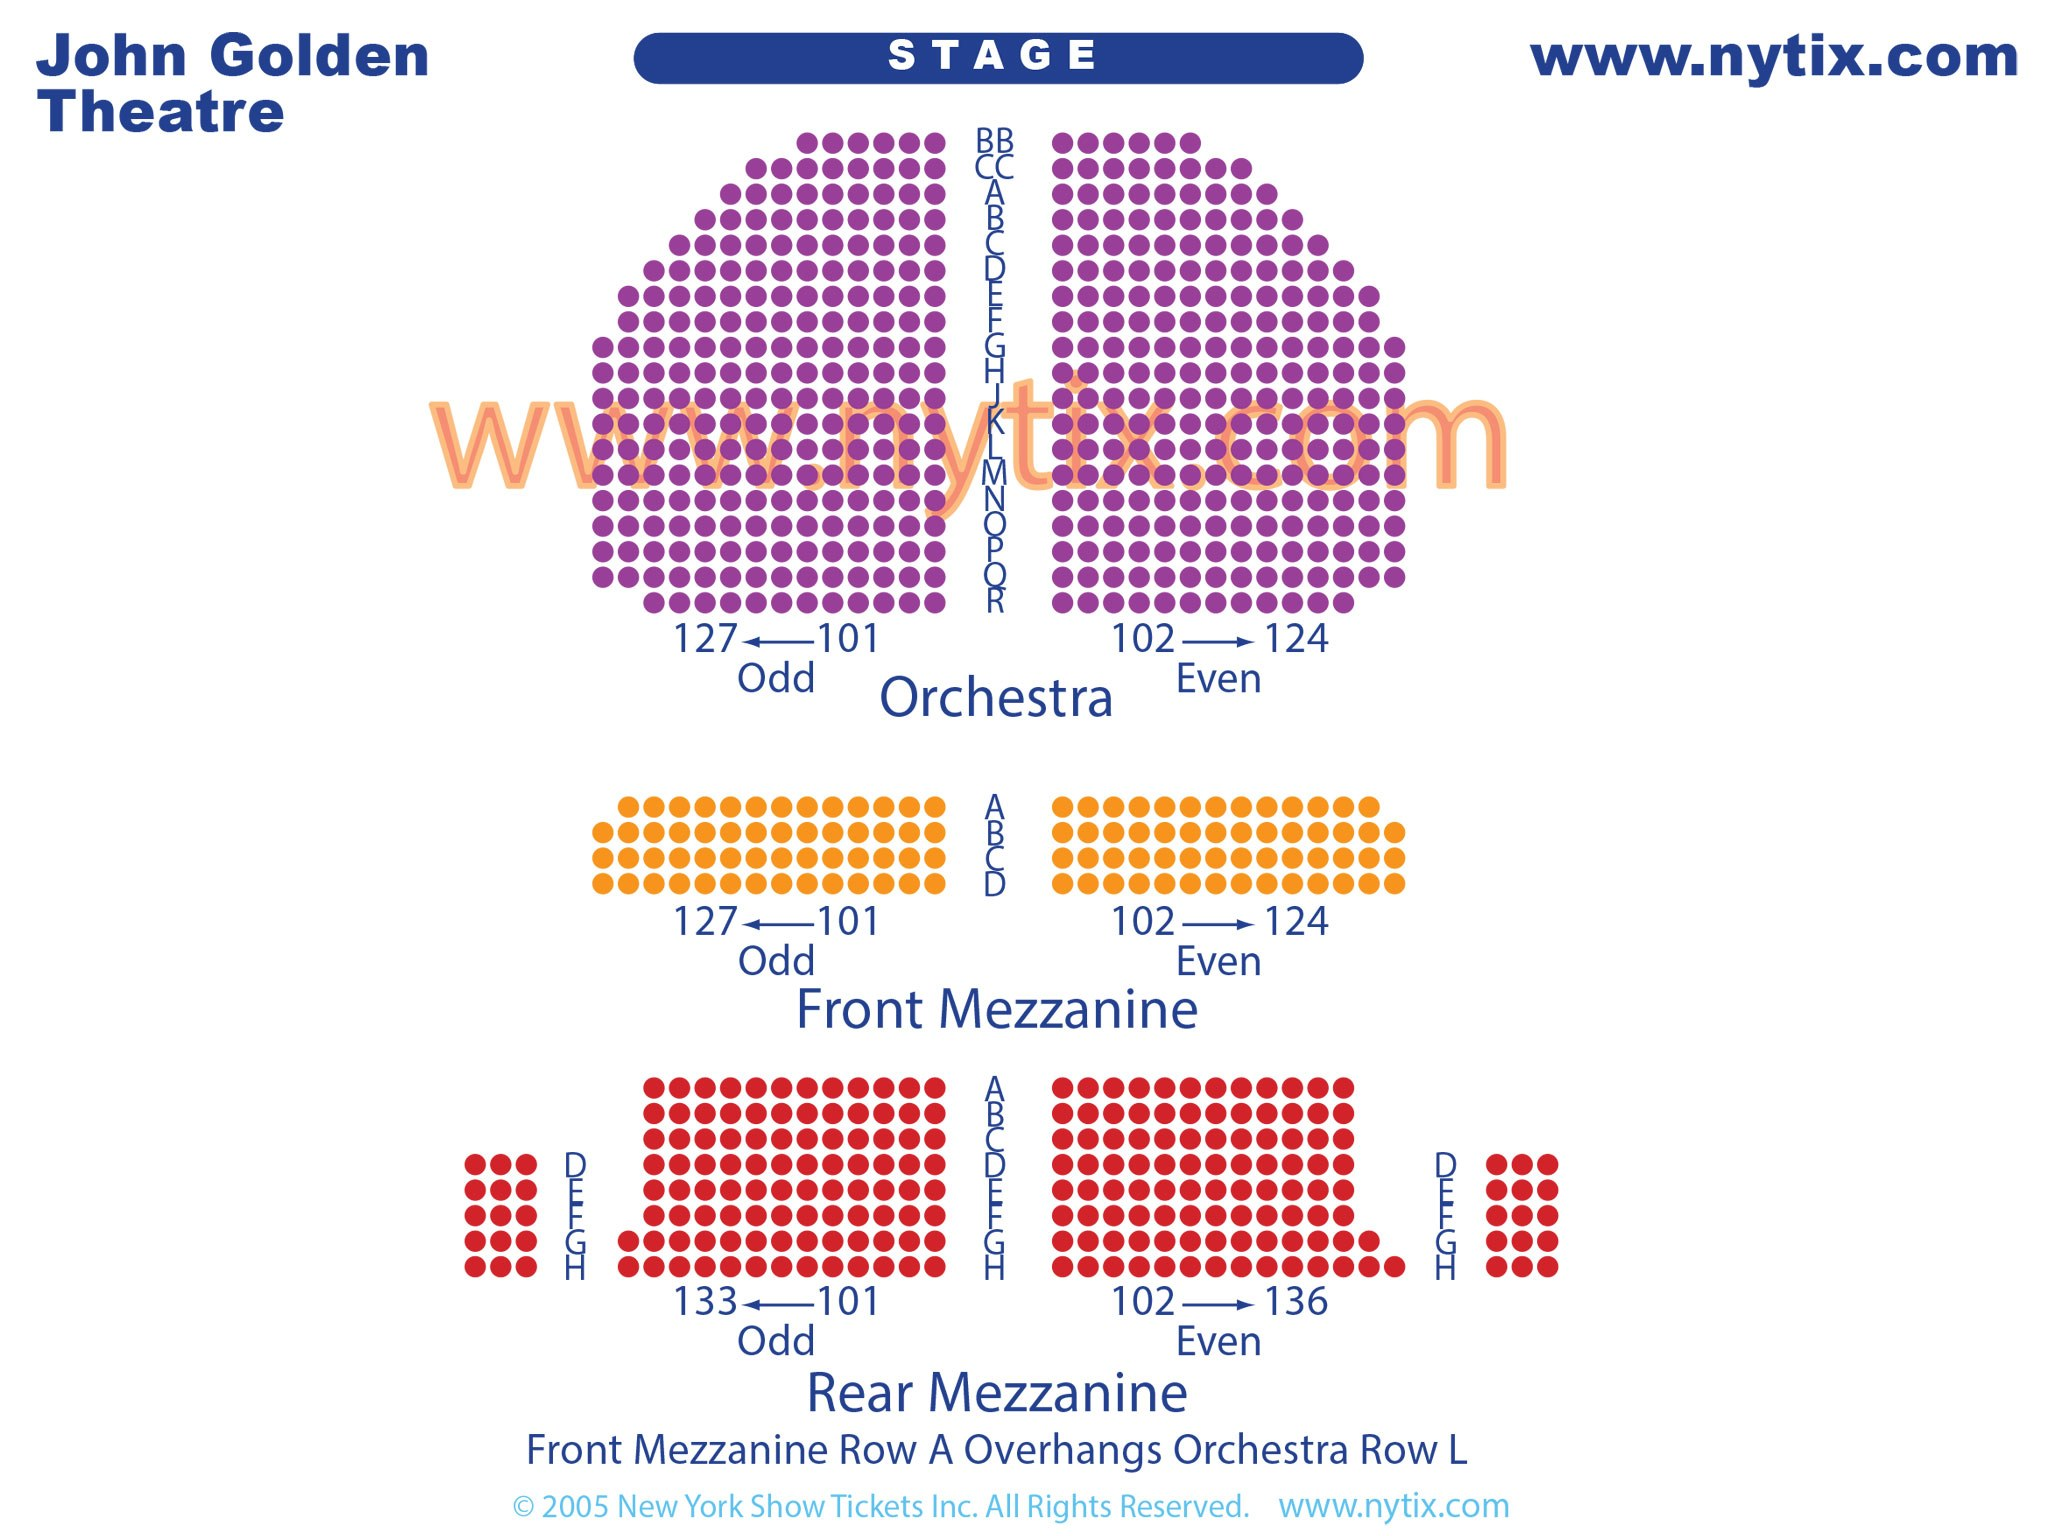 John Golden Broadway Theatre Seating Chart